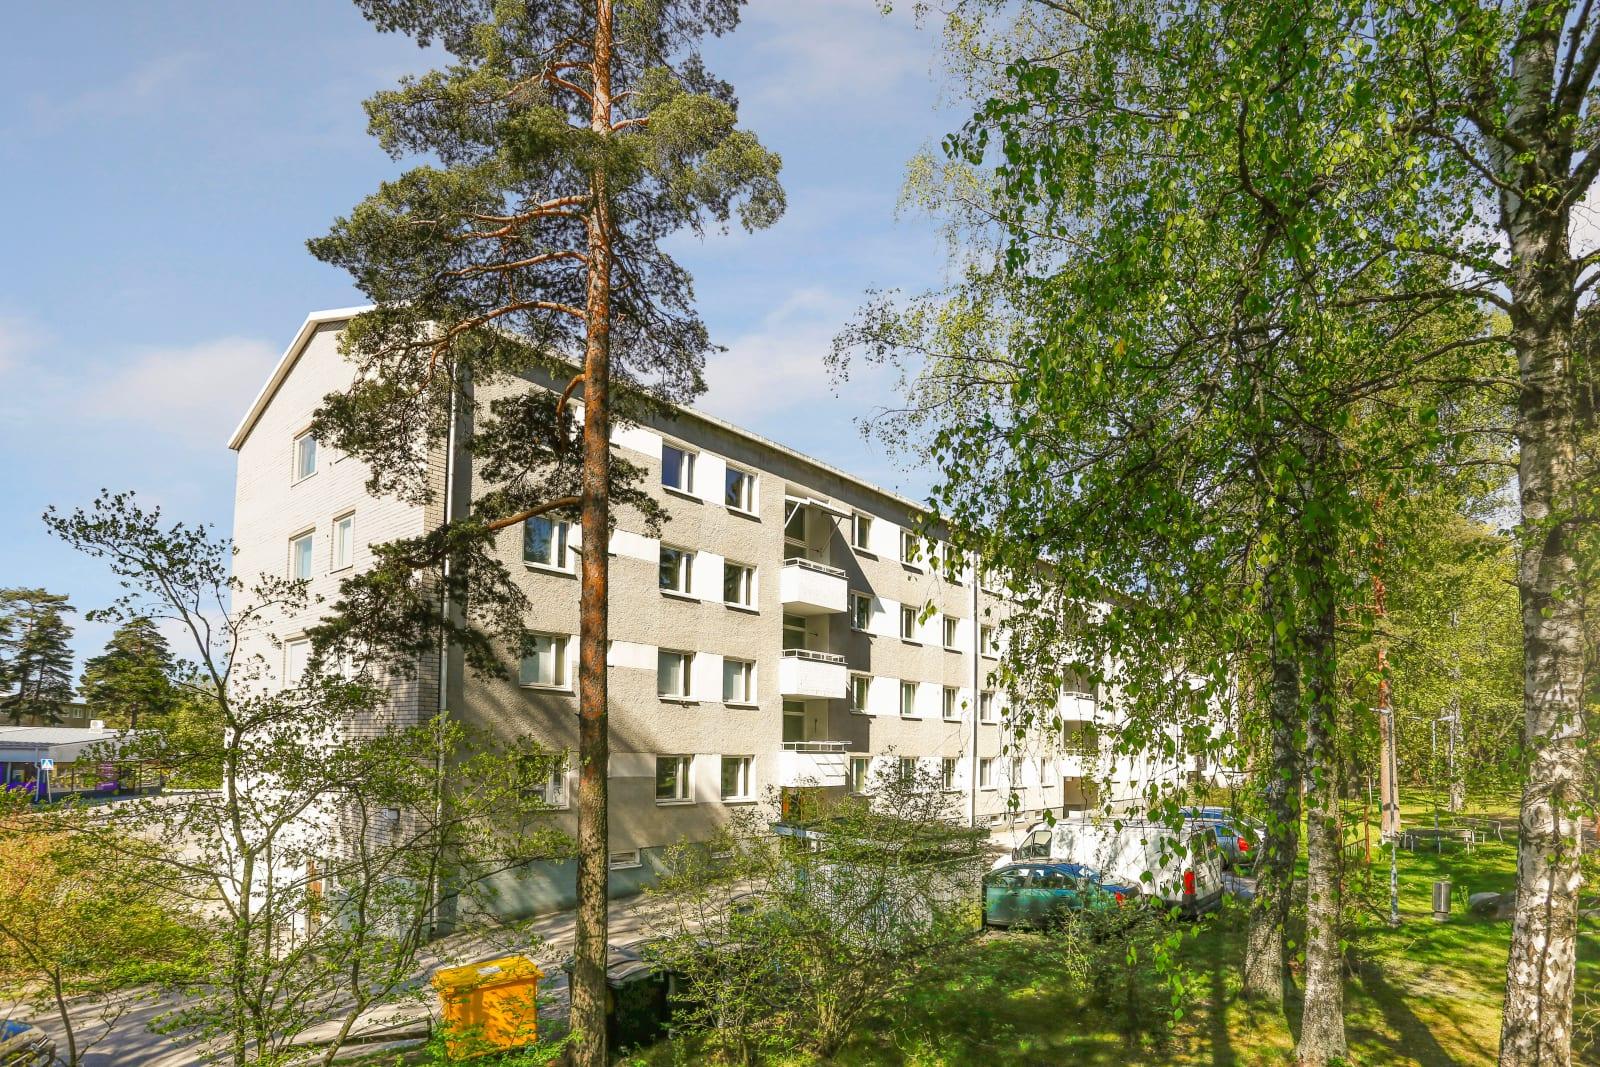 Helsinki, Pitäjänmäki, Pajamäentie 7